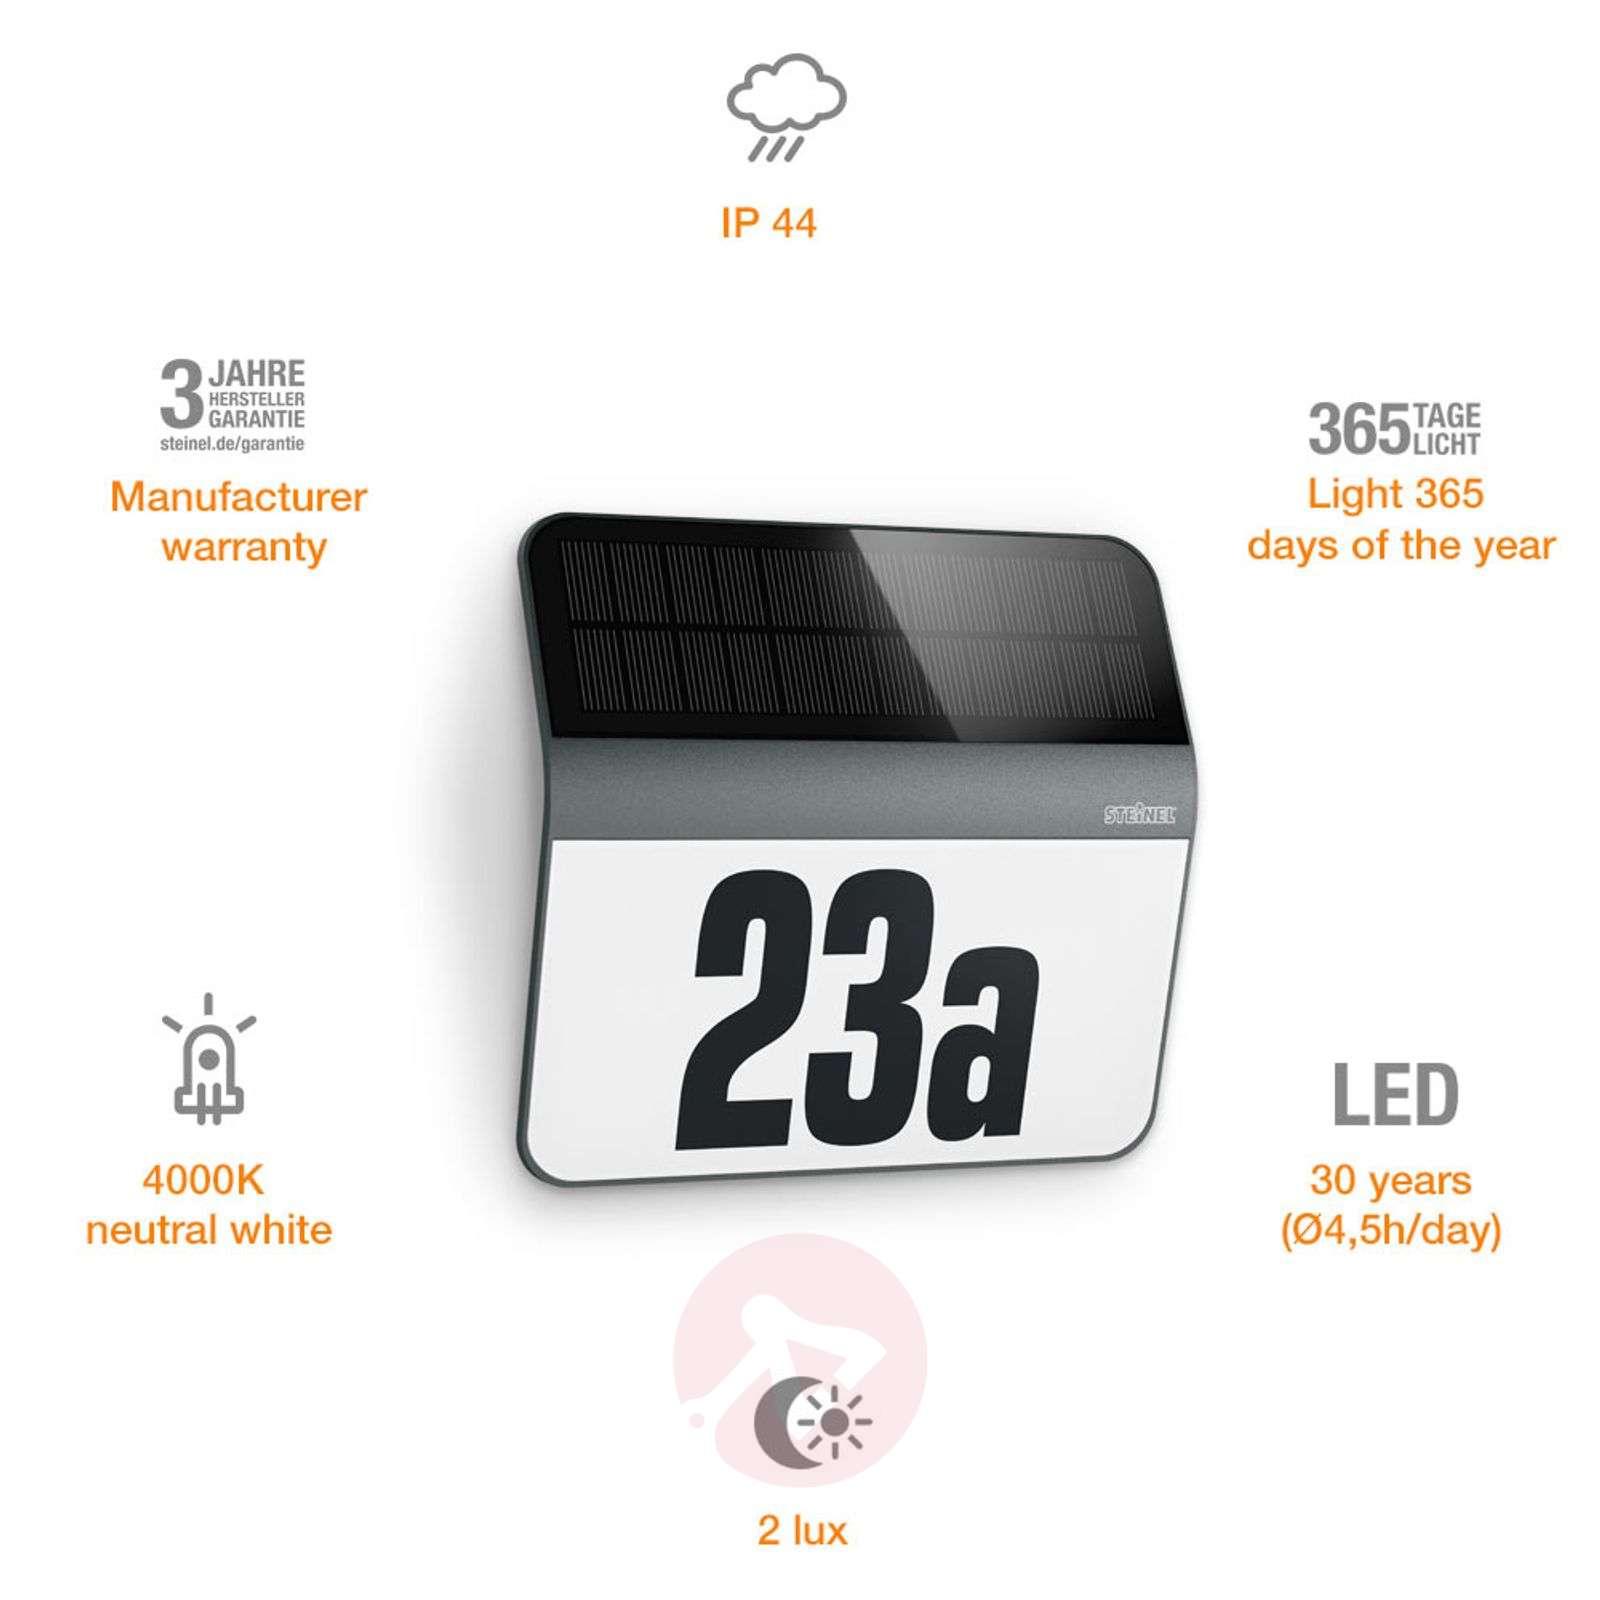 STEINEL LH-N LED-talonnumerovalaisin seinälle-8505719-01